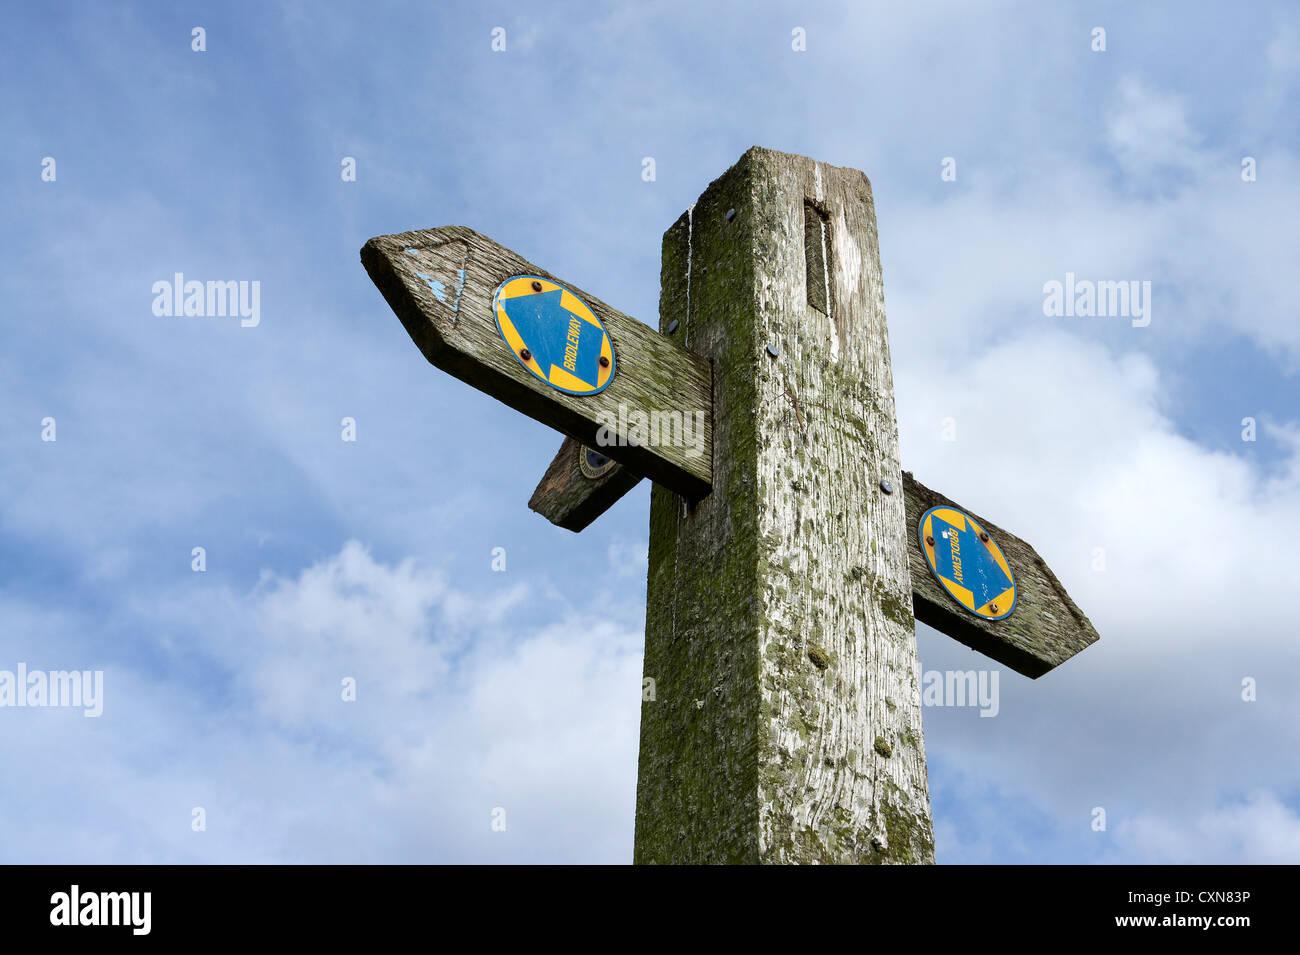 Bridleway fingerpost - Stock Image